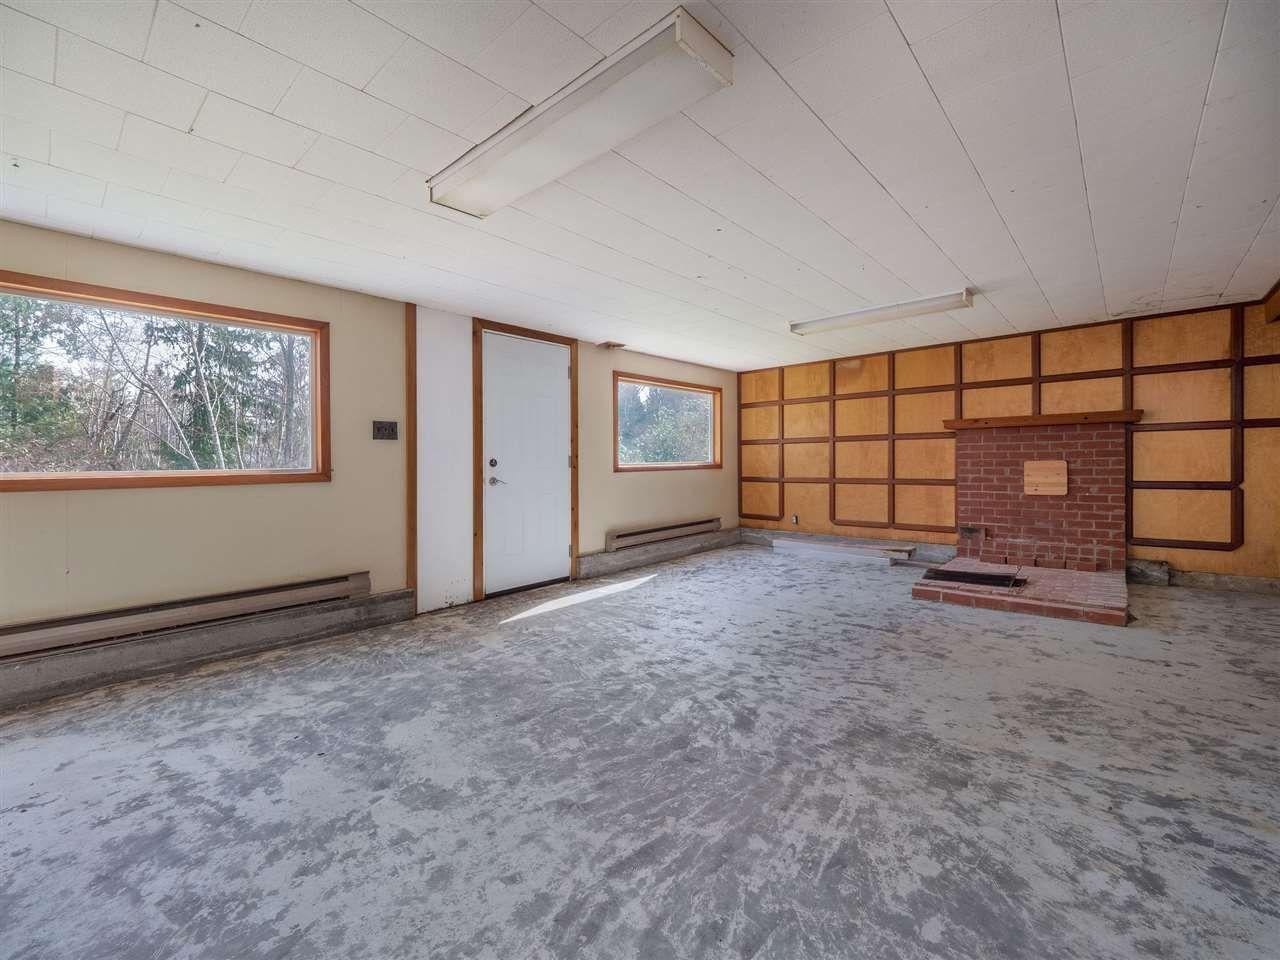 Photo 18: Photos: 6820 NORWEST BAY Road in Sechelt: Sechelt District House for sale (Sunshine Coast)  : MLS®# R2553107